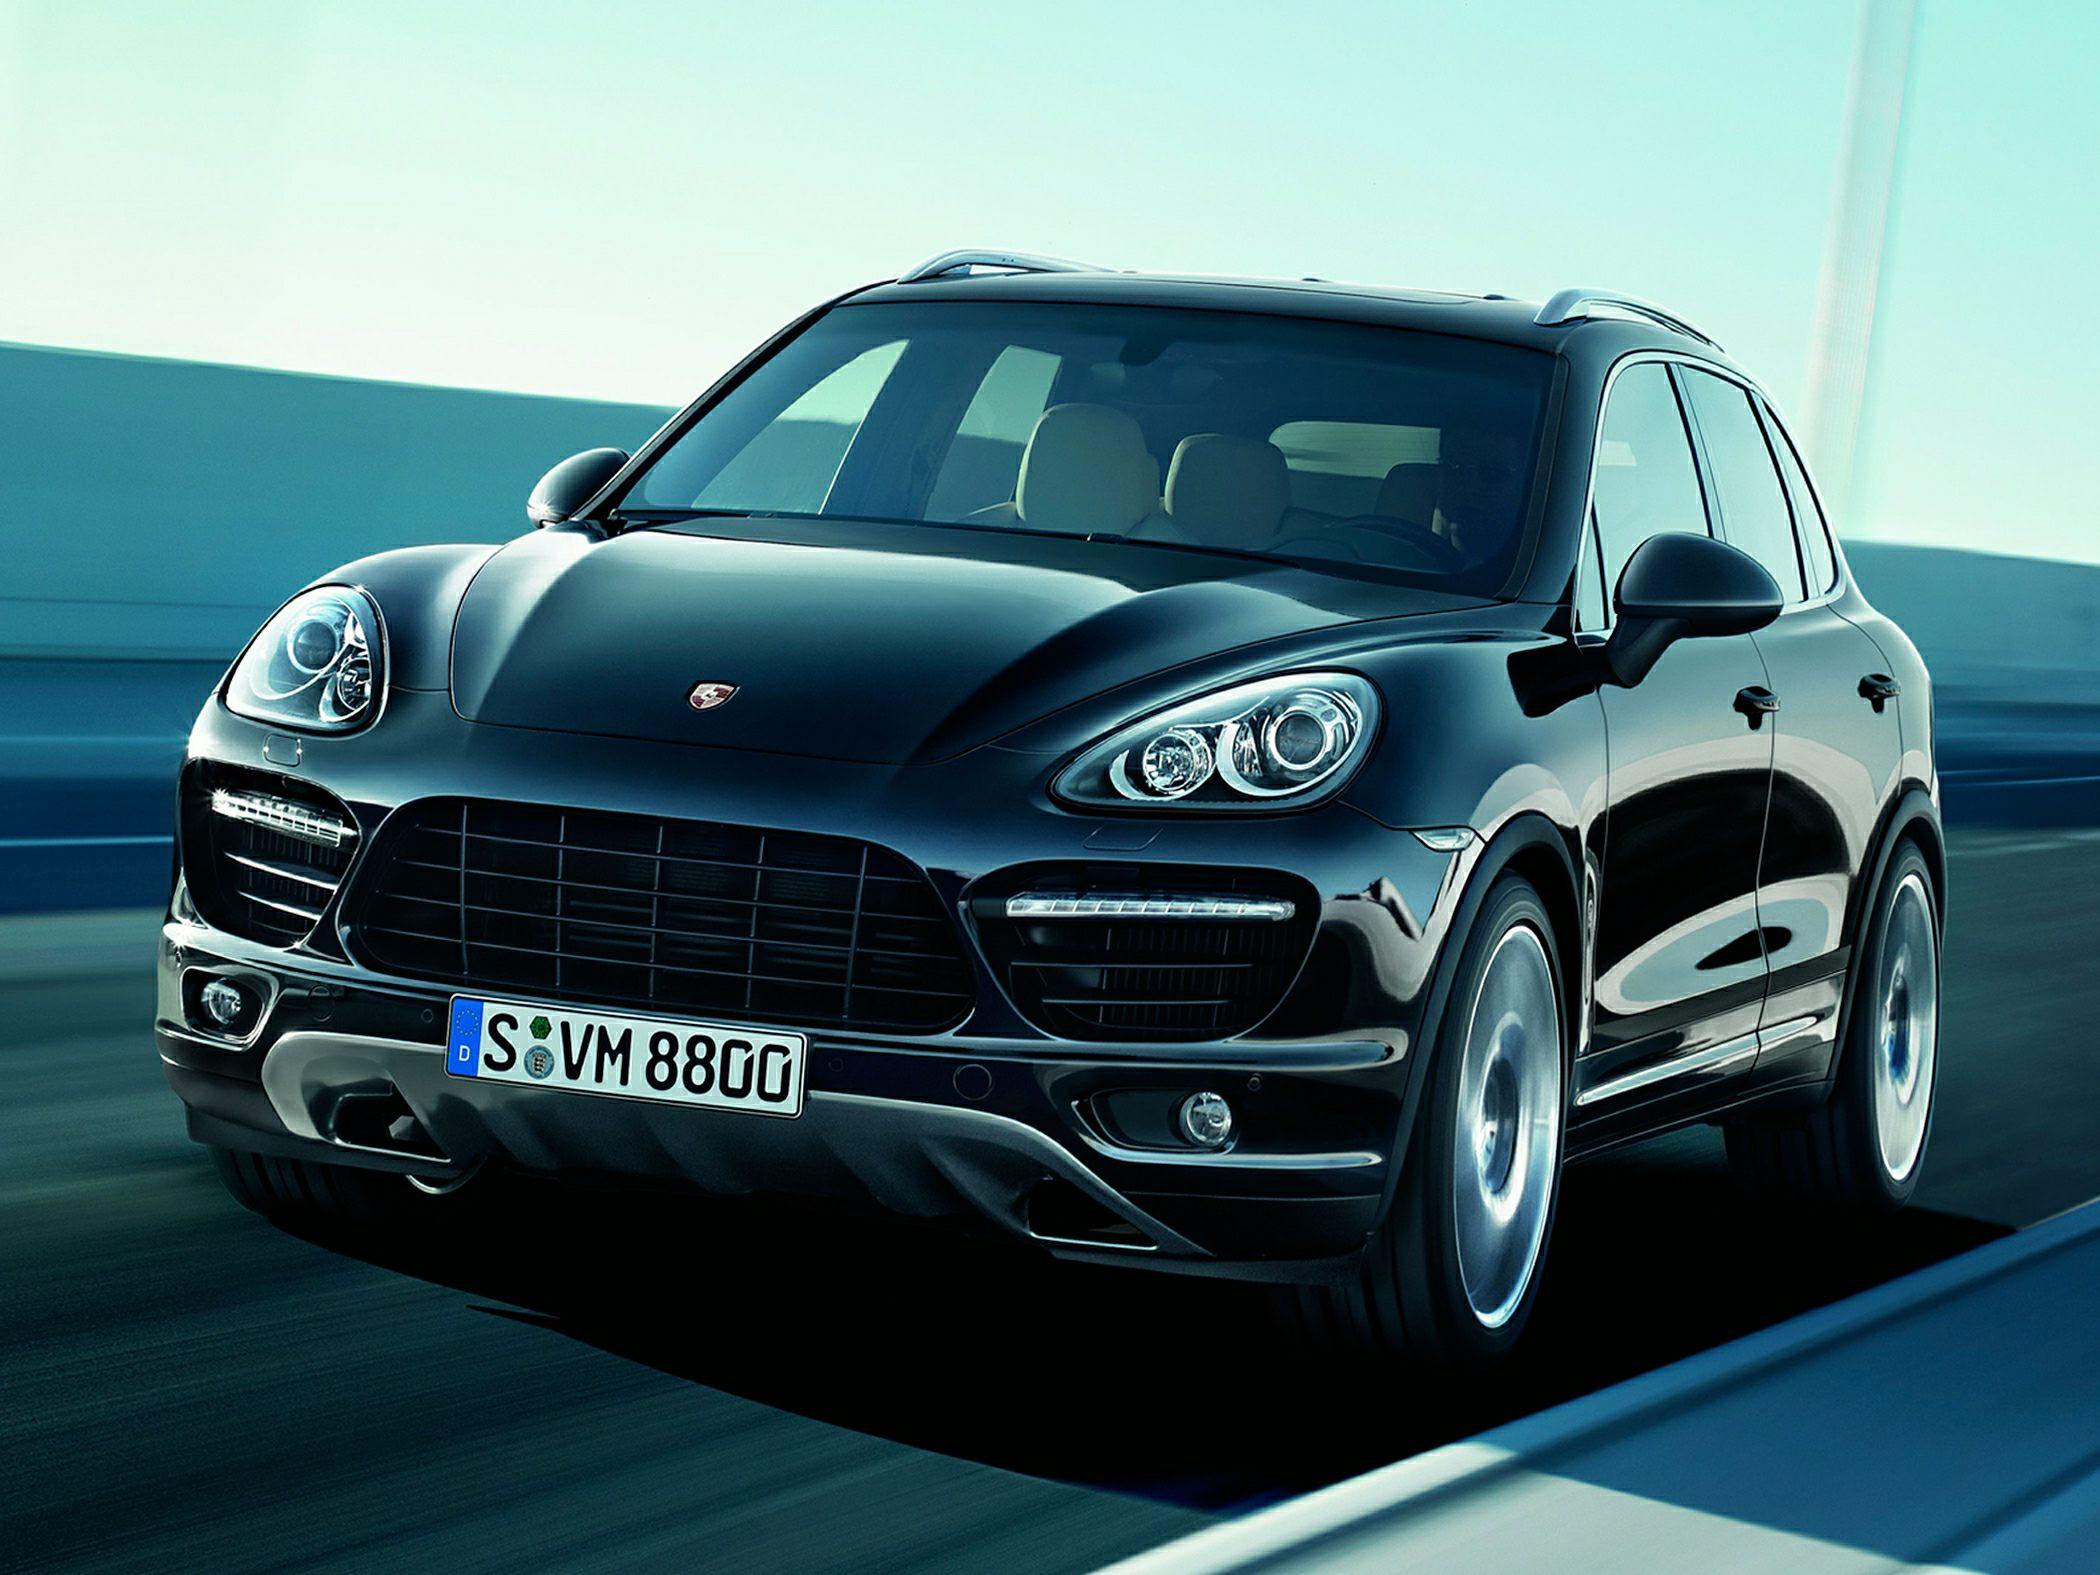 2014 Porsche Cayenne Styles Amp Features Highlights